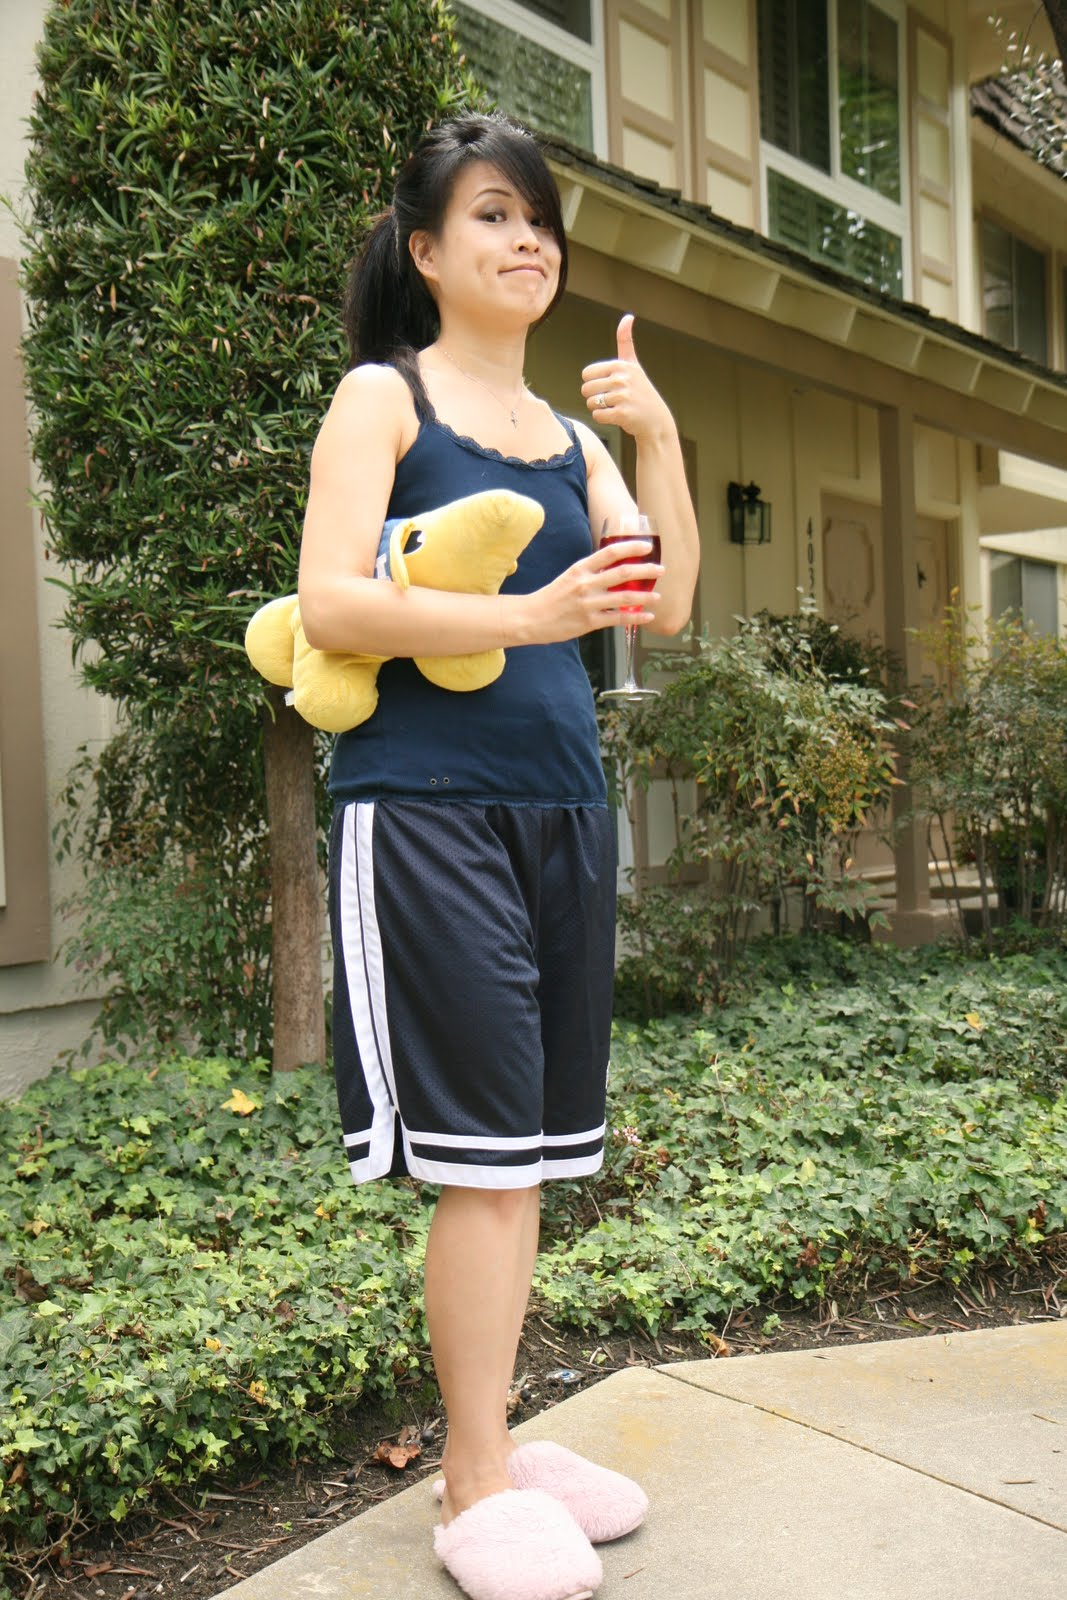 basketball shorts on girls